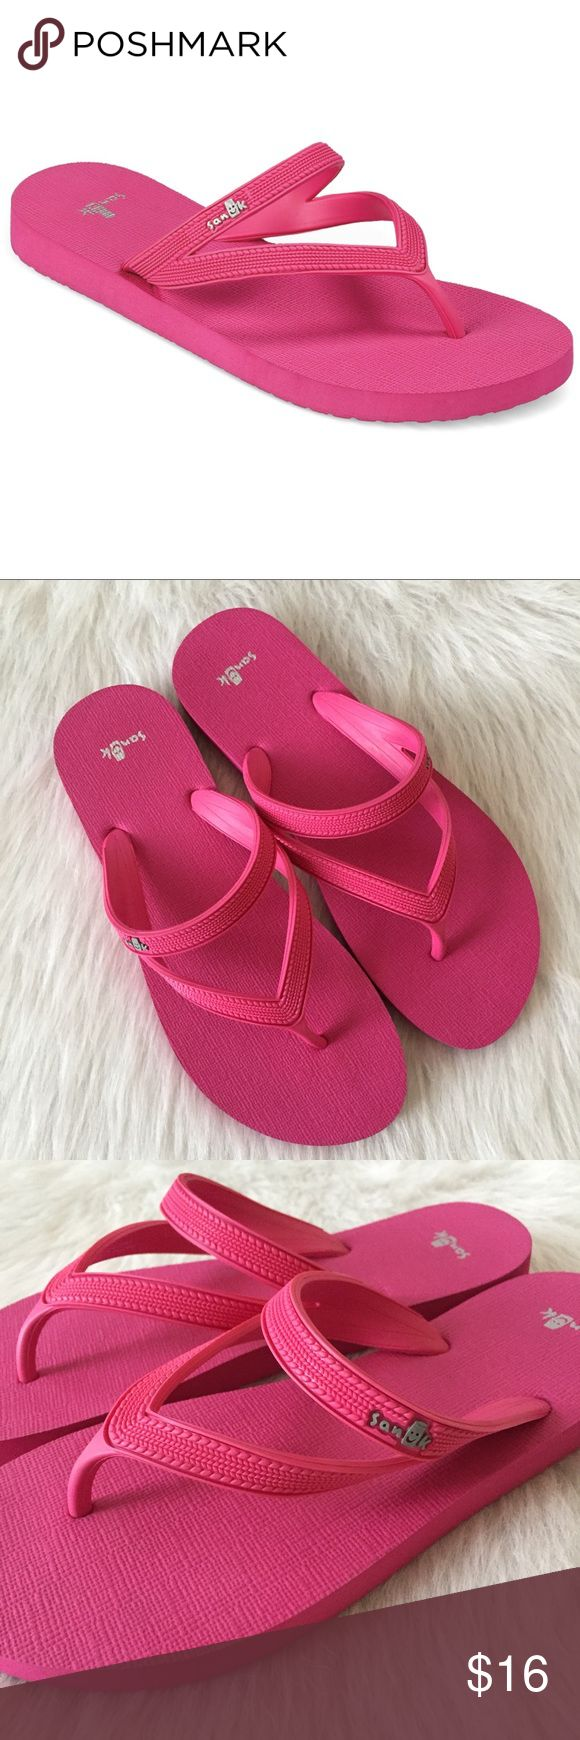 Sanuk pink Selene flip flop sandals Cute and comfy Sanuk flip flops in excellent condition! Fuchsia pink, size 8-9. Sanuk Shoes Sandals